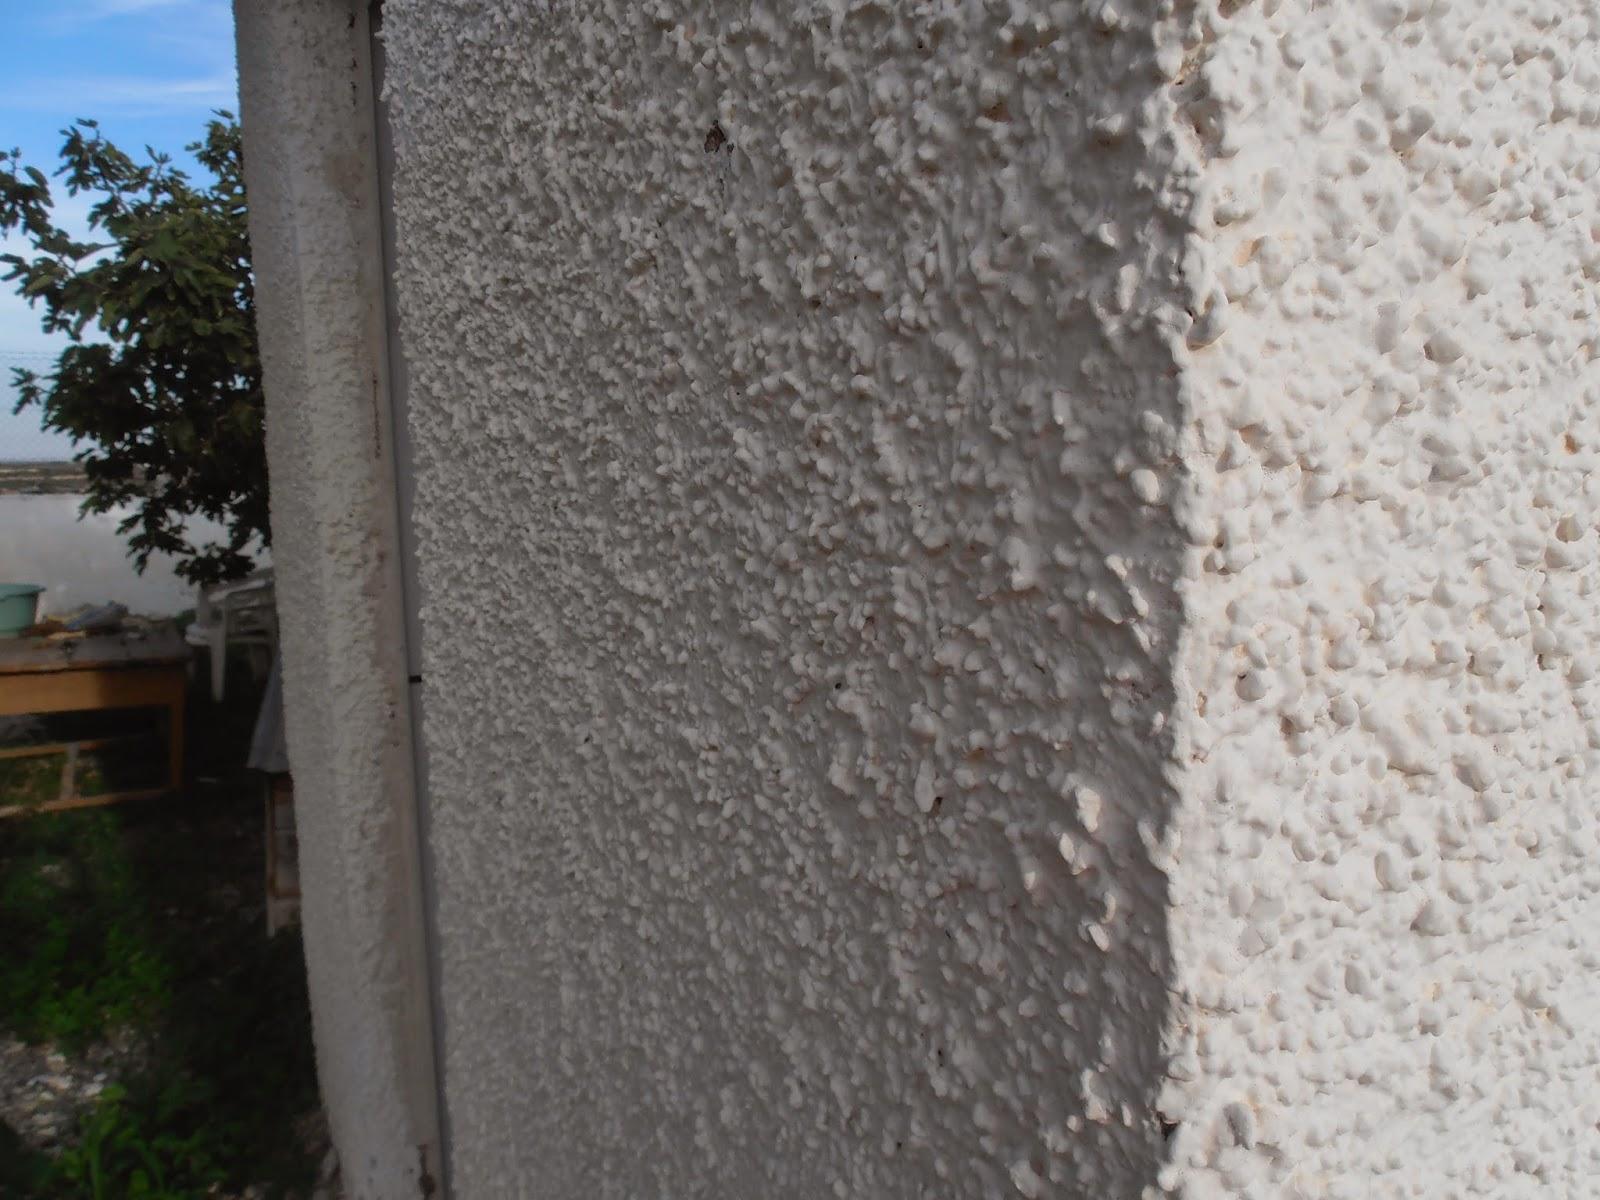 Construide revestimiento a la tirolesa gota o gotel y - Como quitar el gotele de la pared ...